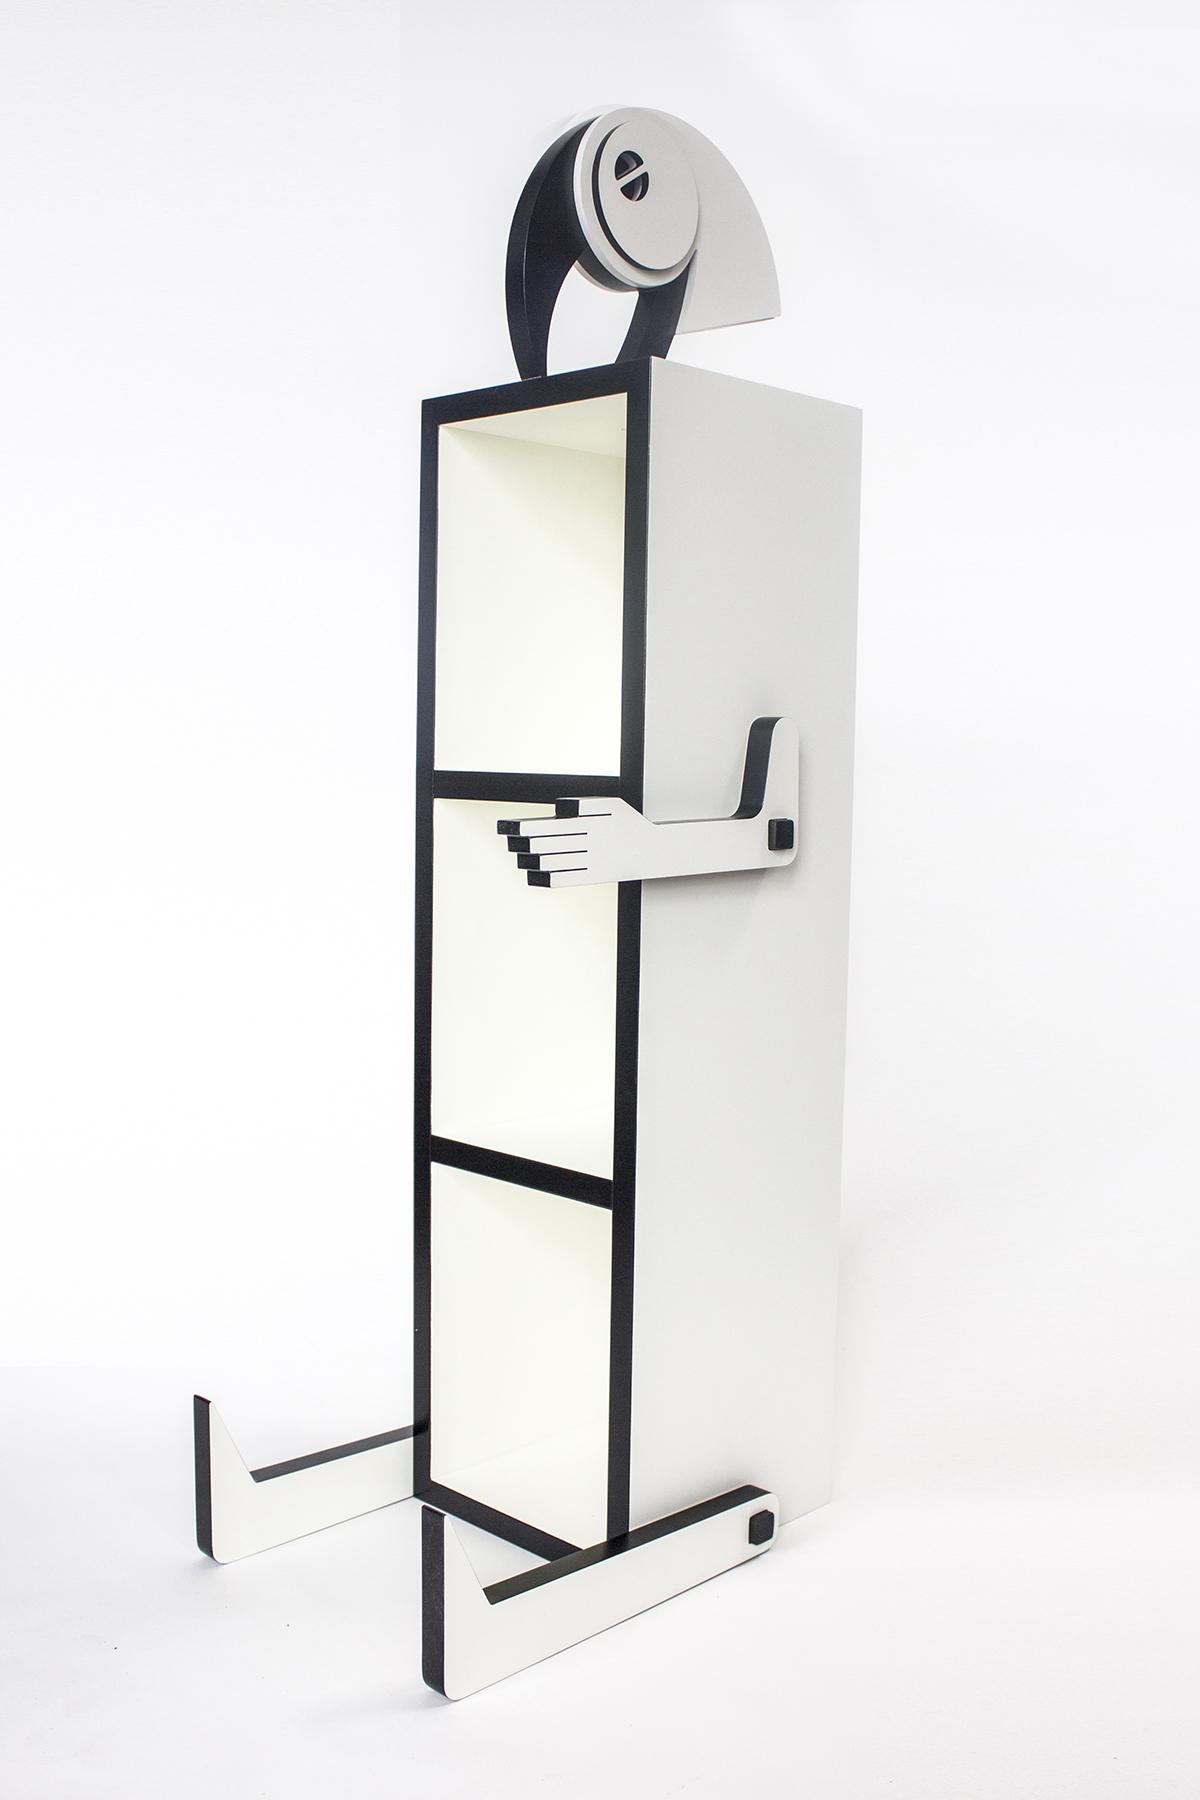 Crawl-chair-Materiallust-New-York-Design-Week-Collective-Childrens-Furniture-20.jpg